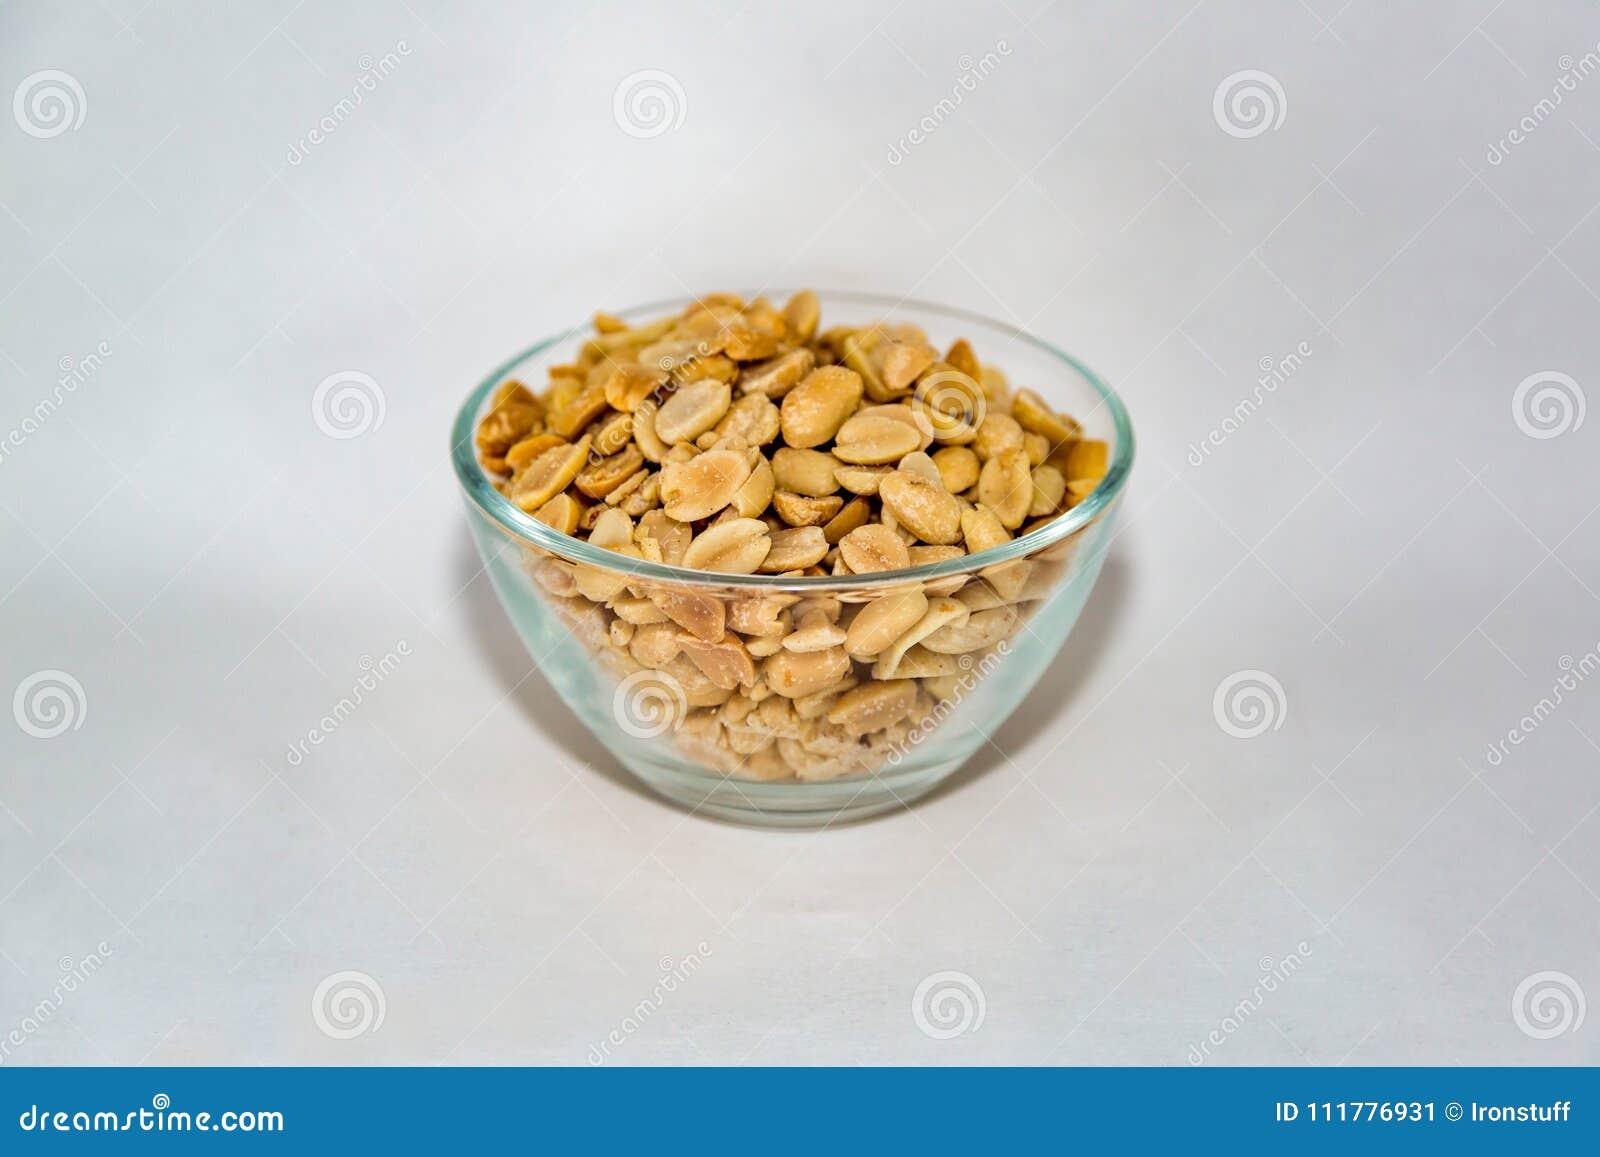 Peanuts in a glass bowl